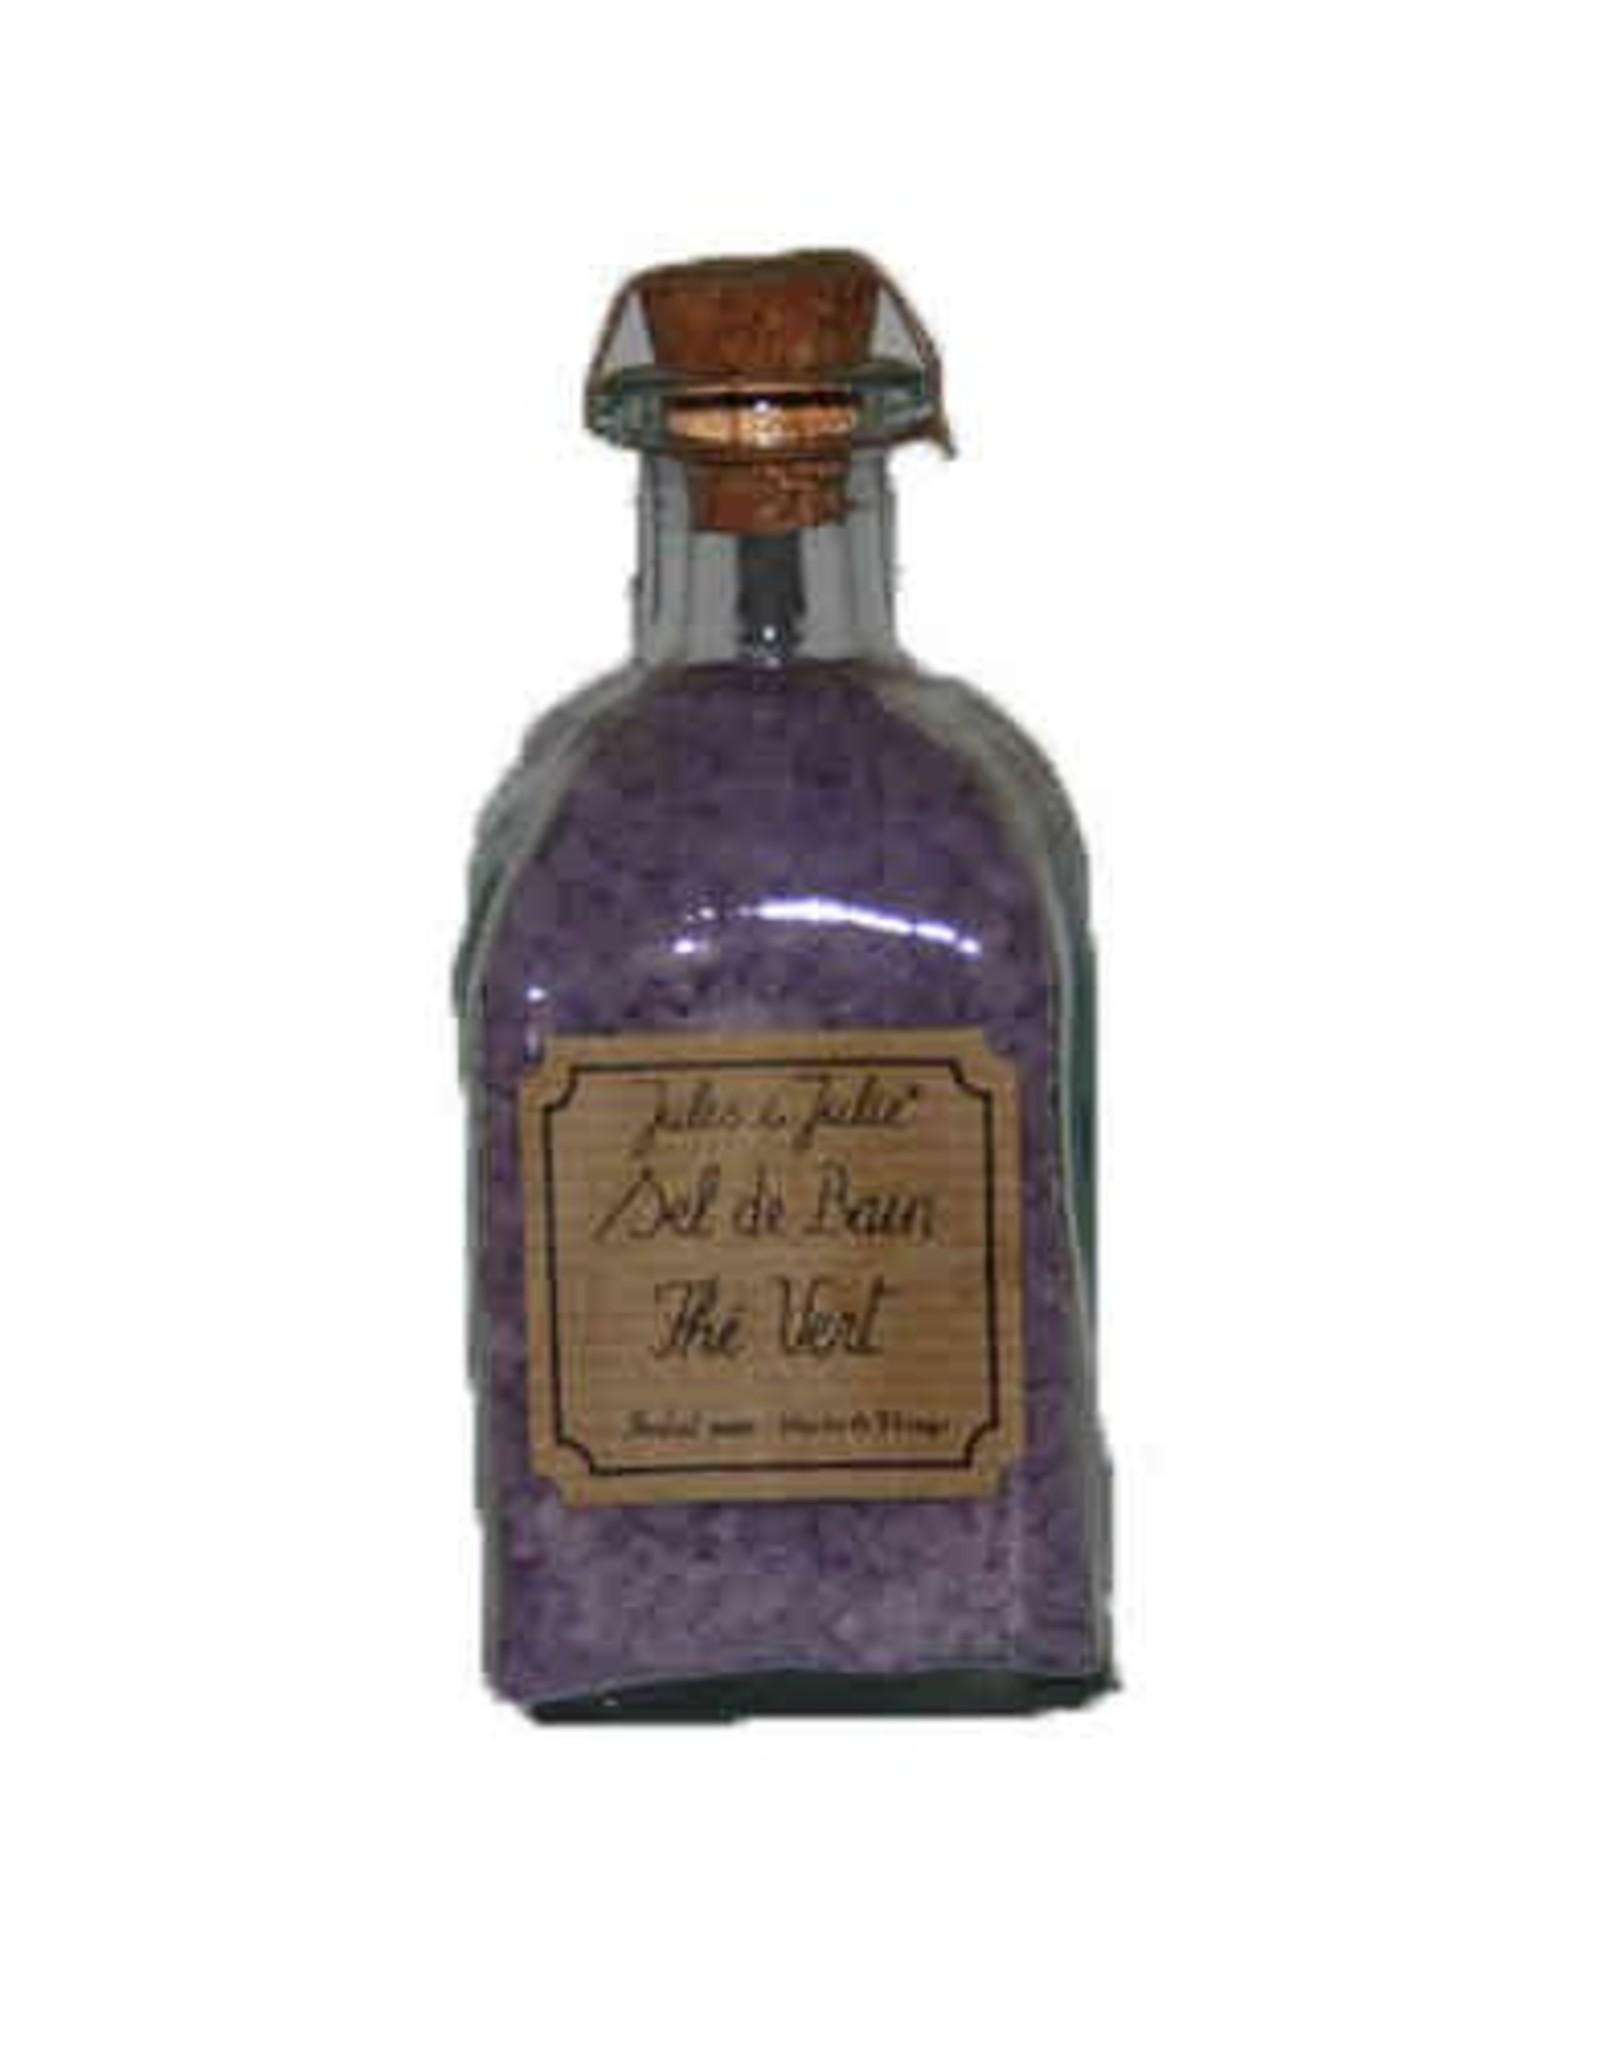 Jules & Julie 'the Vert' - Body & Soap